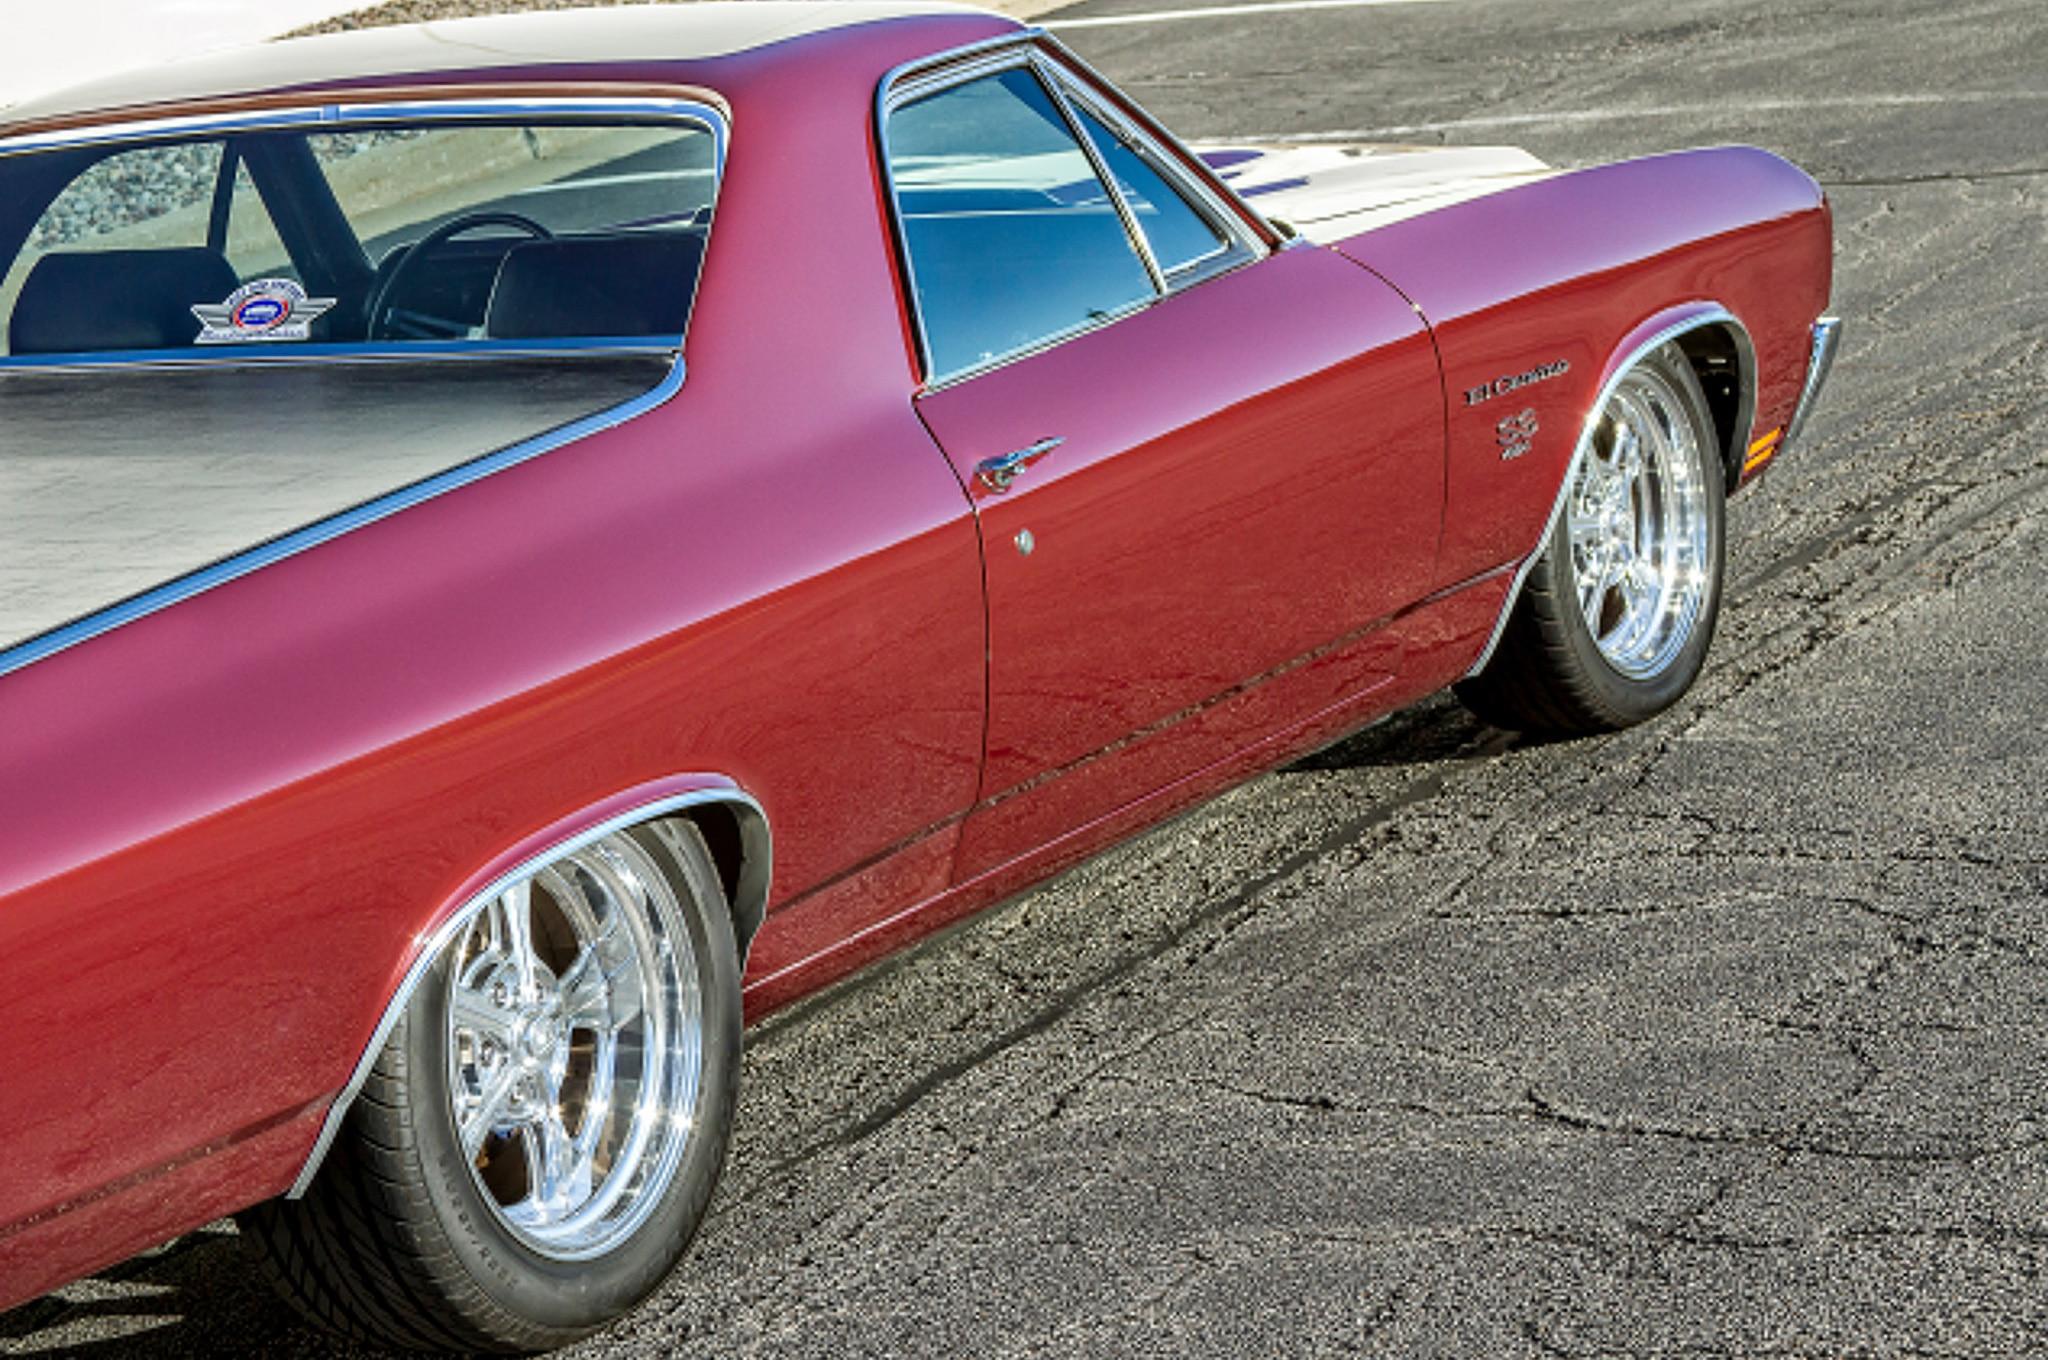 How One Enthusiast Built A 500 Hp 1970 Chevrolet El Camino Ss